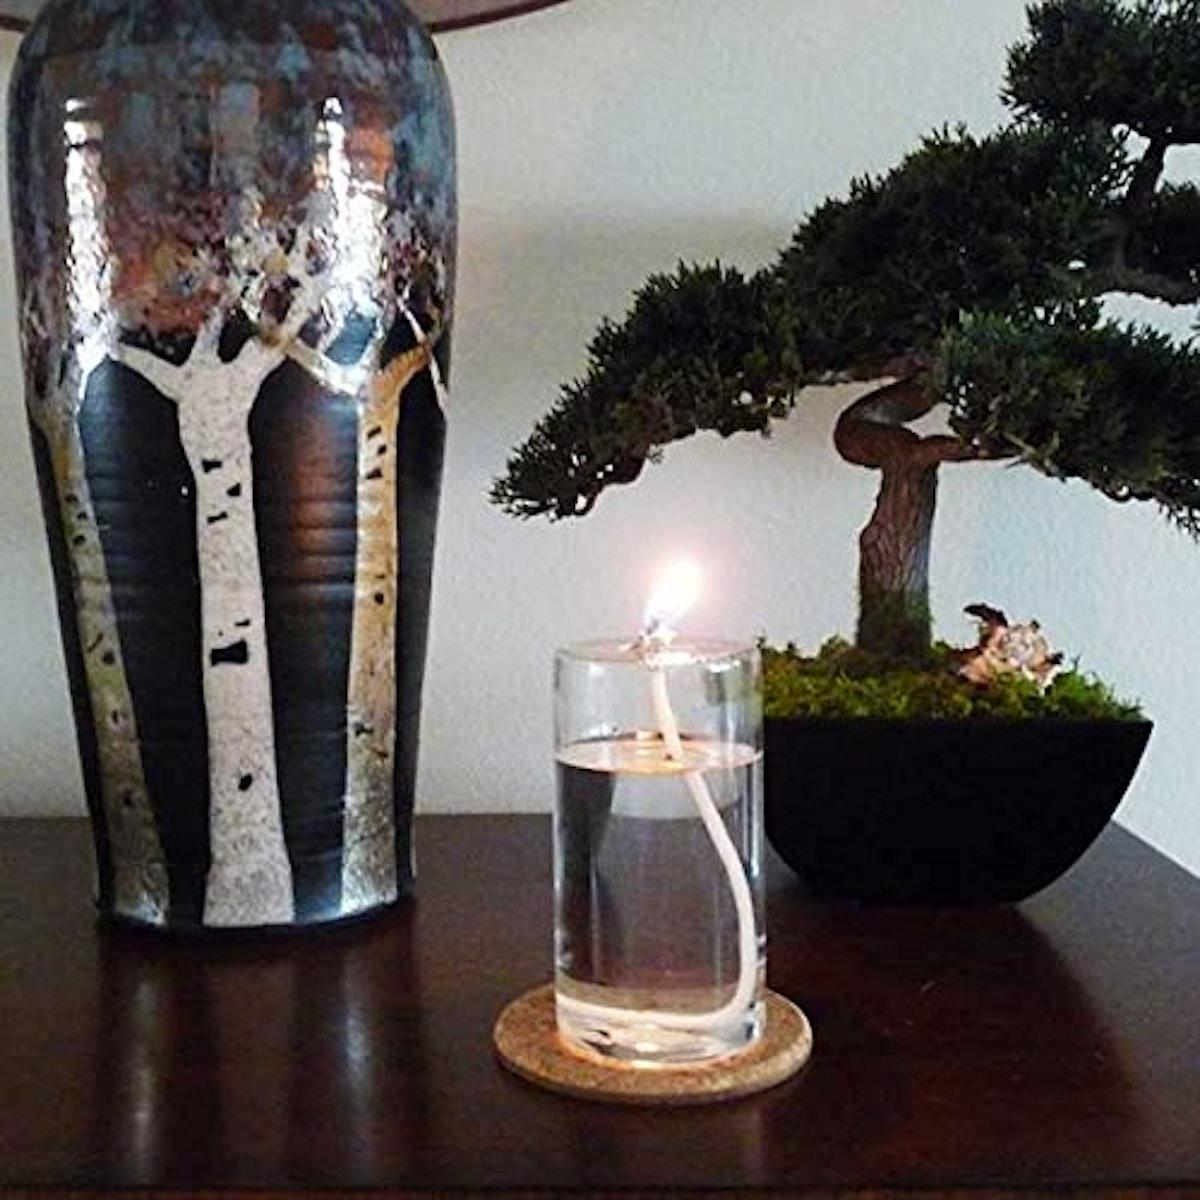 Firefly Refillable Glass Pillar Candle